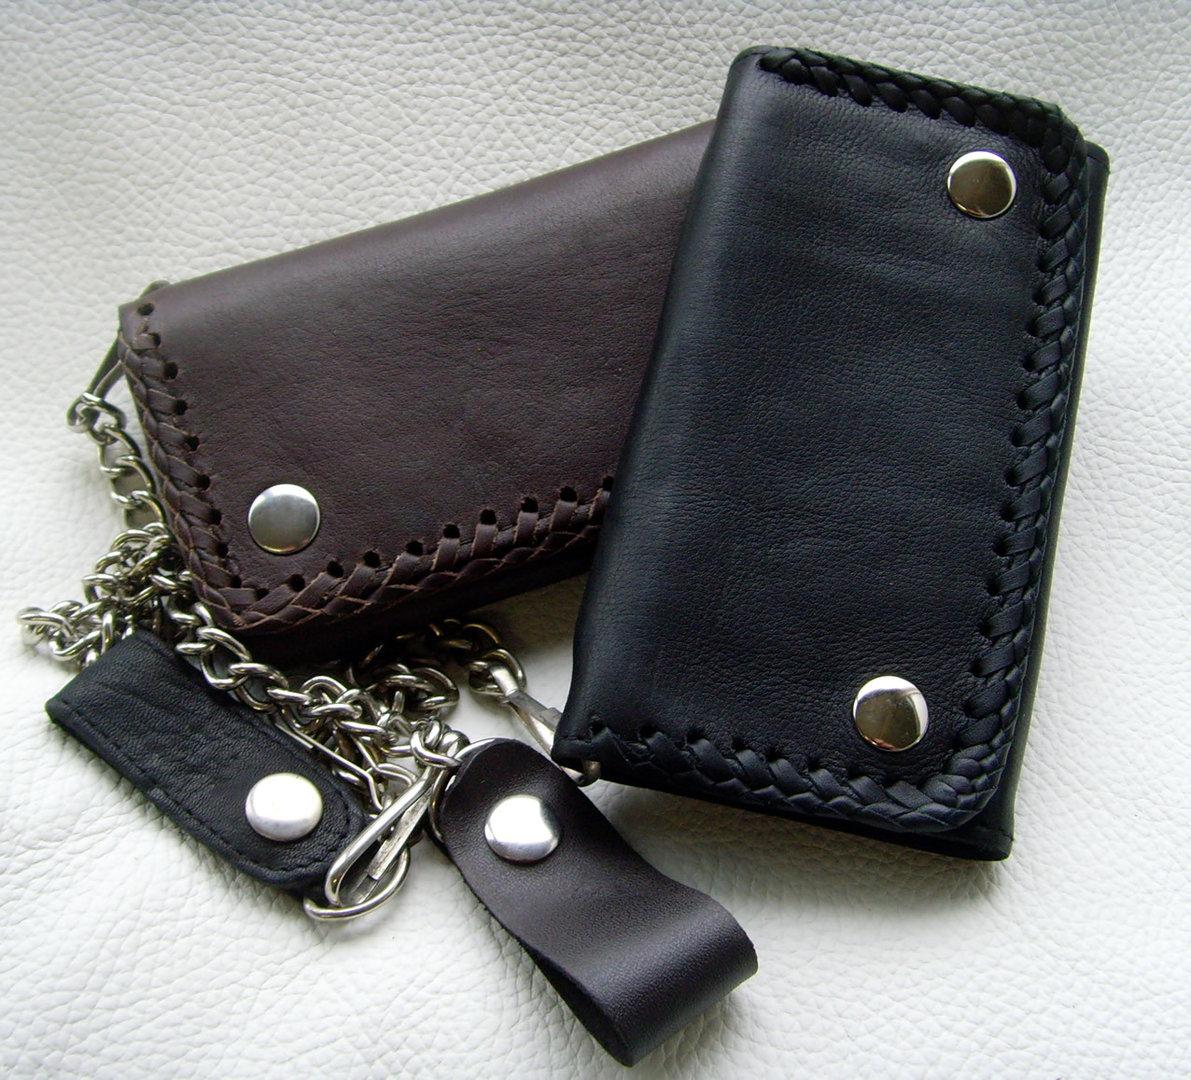 biker b rse rindsleder geflochten schwarz oder braun wallet. Black Bedroom Furniture Sets. Home Design Ideas